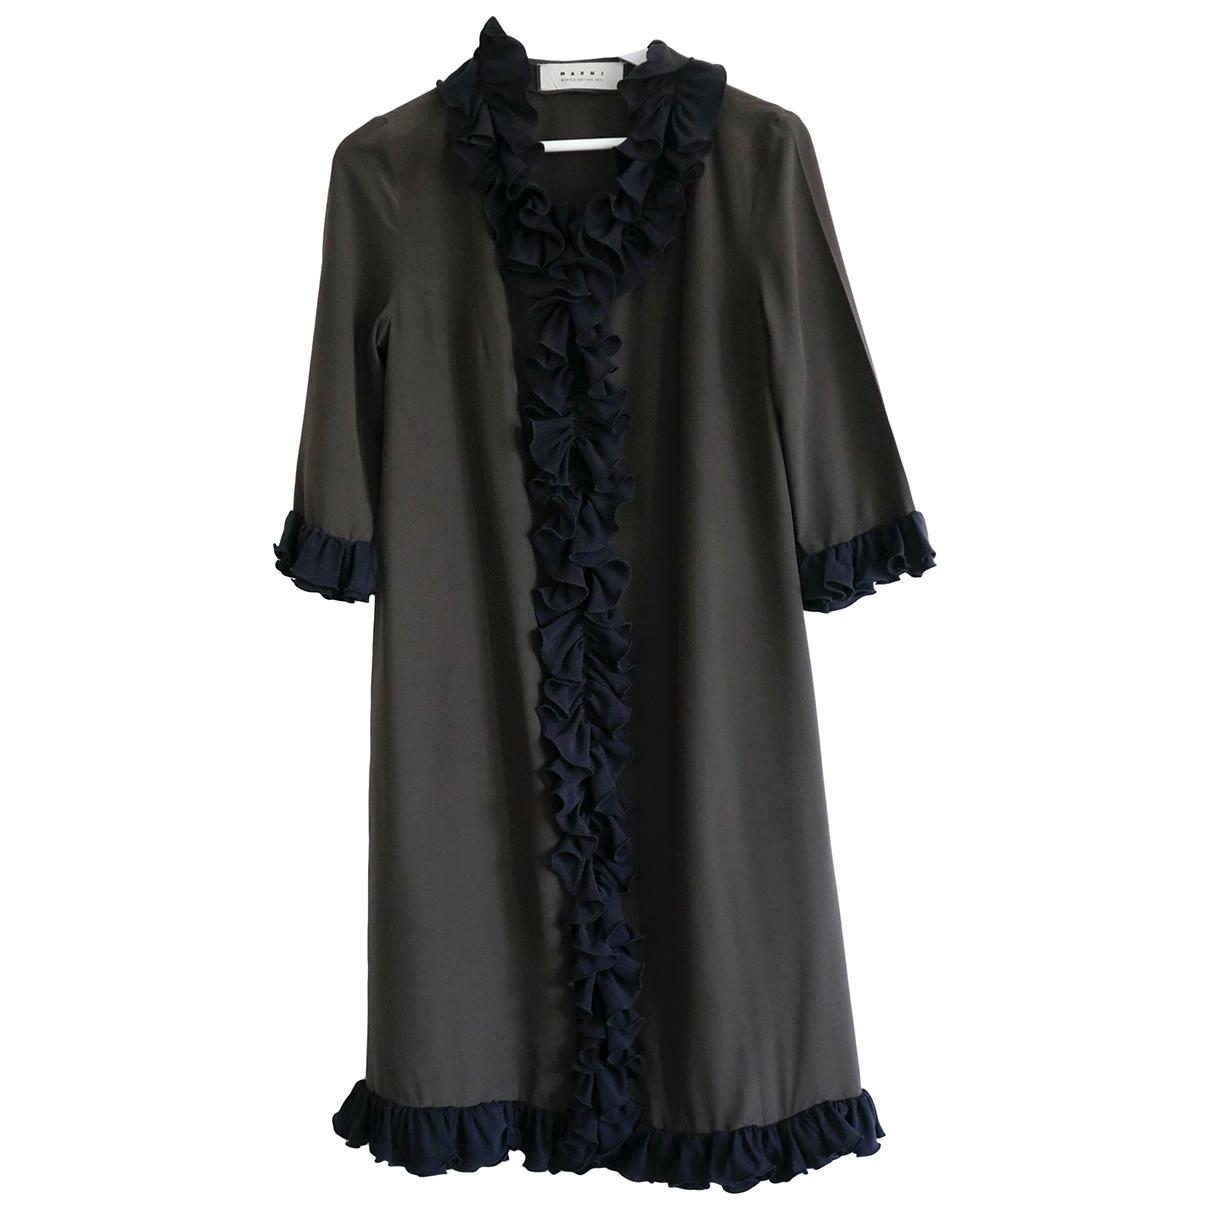 Marni \N Kleid in  Khaki Seide